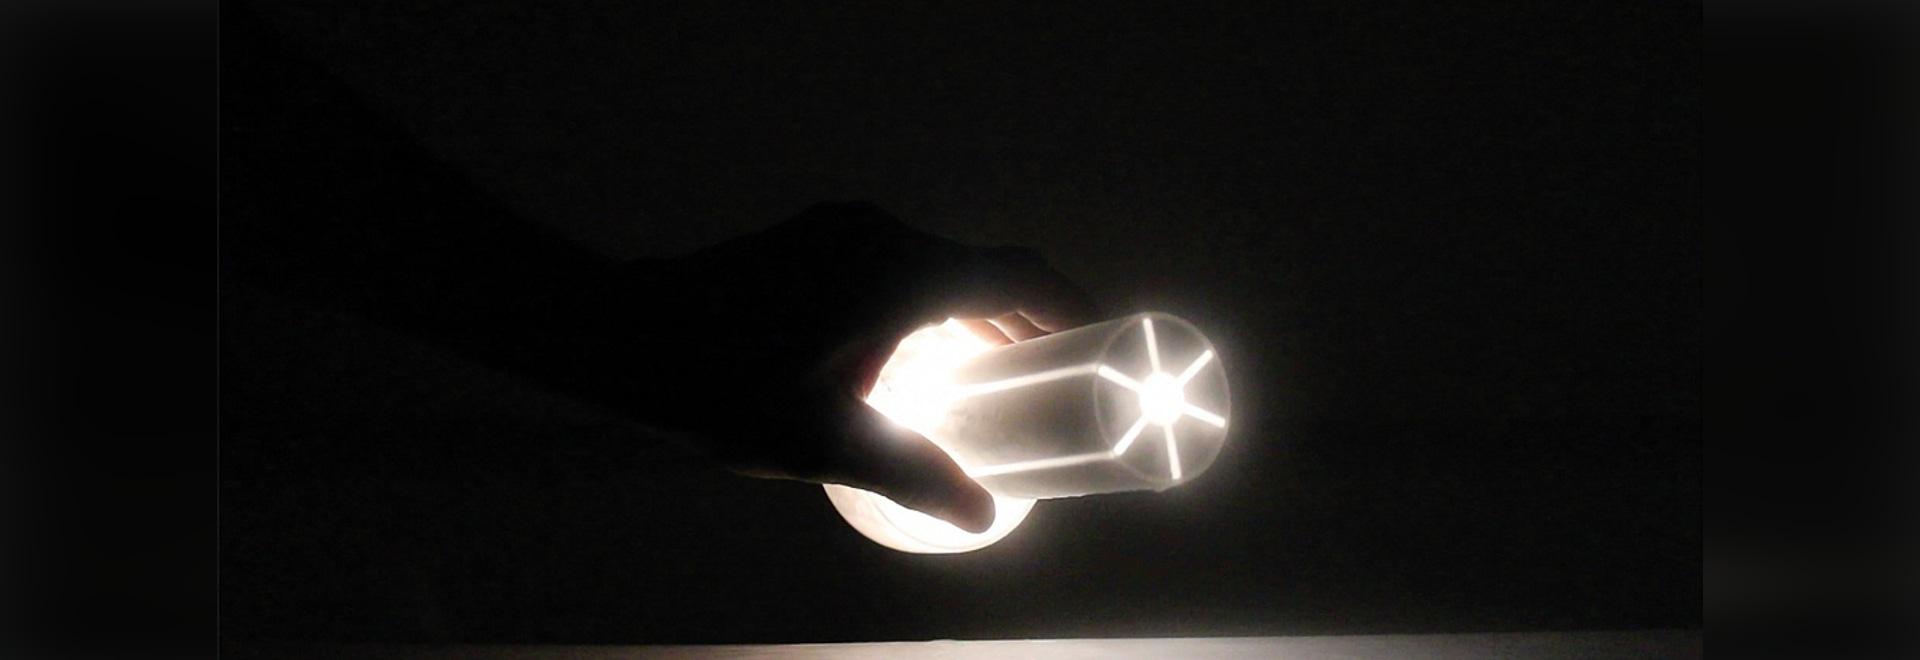 Pure Talents: Bastian Thürich's SALT Lamp